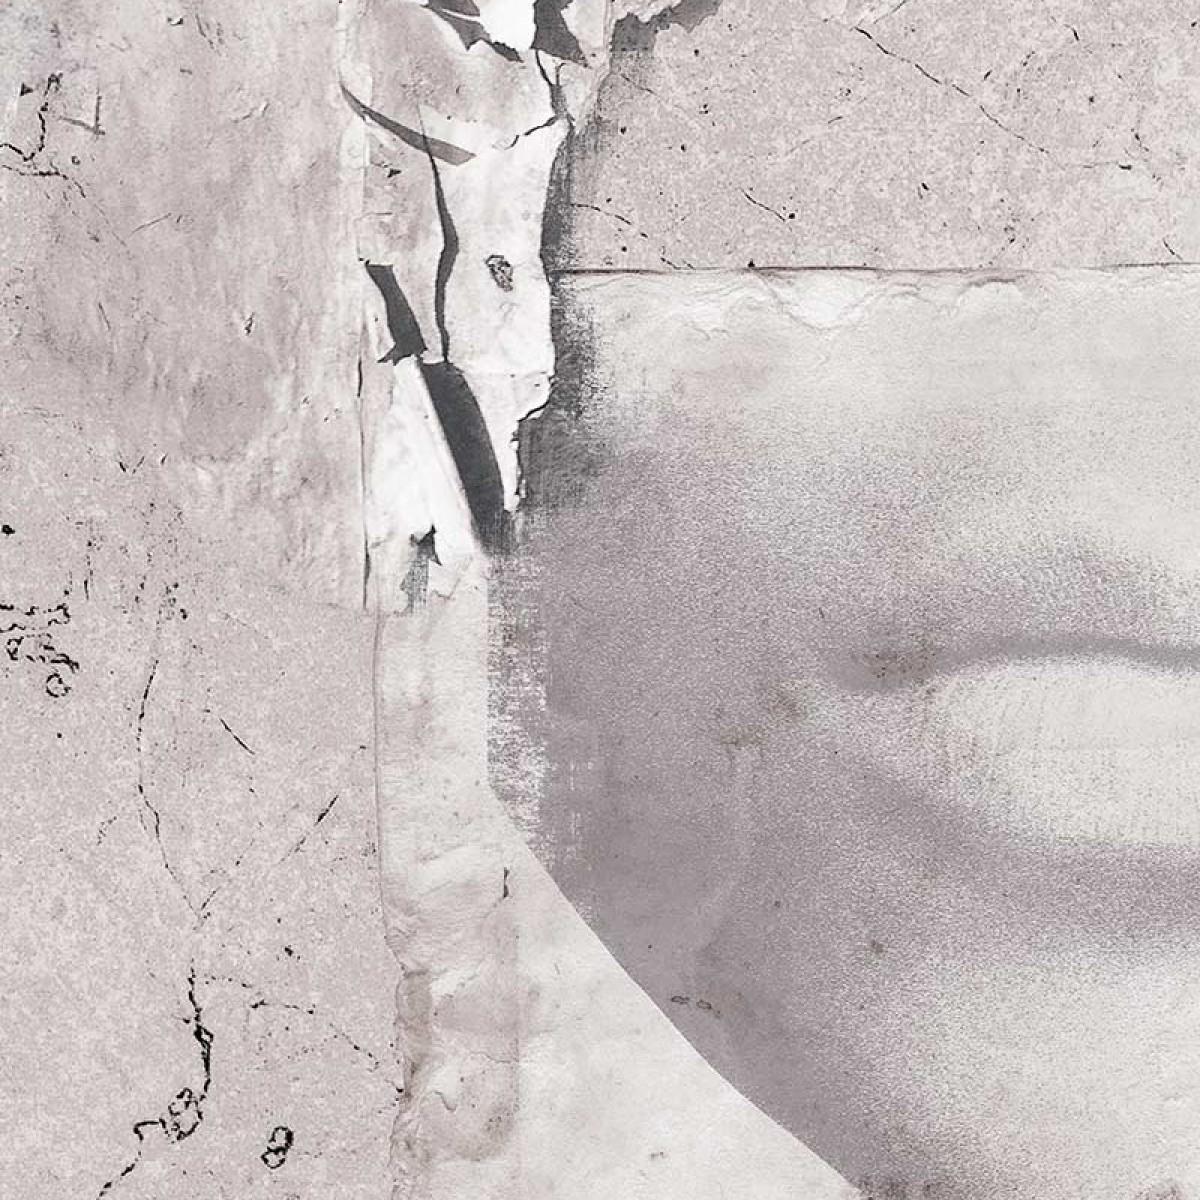 Fototapet contemporan Street Patchwork, personalizat, idea murale